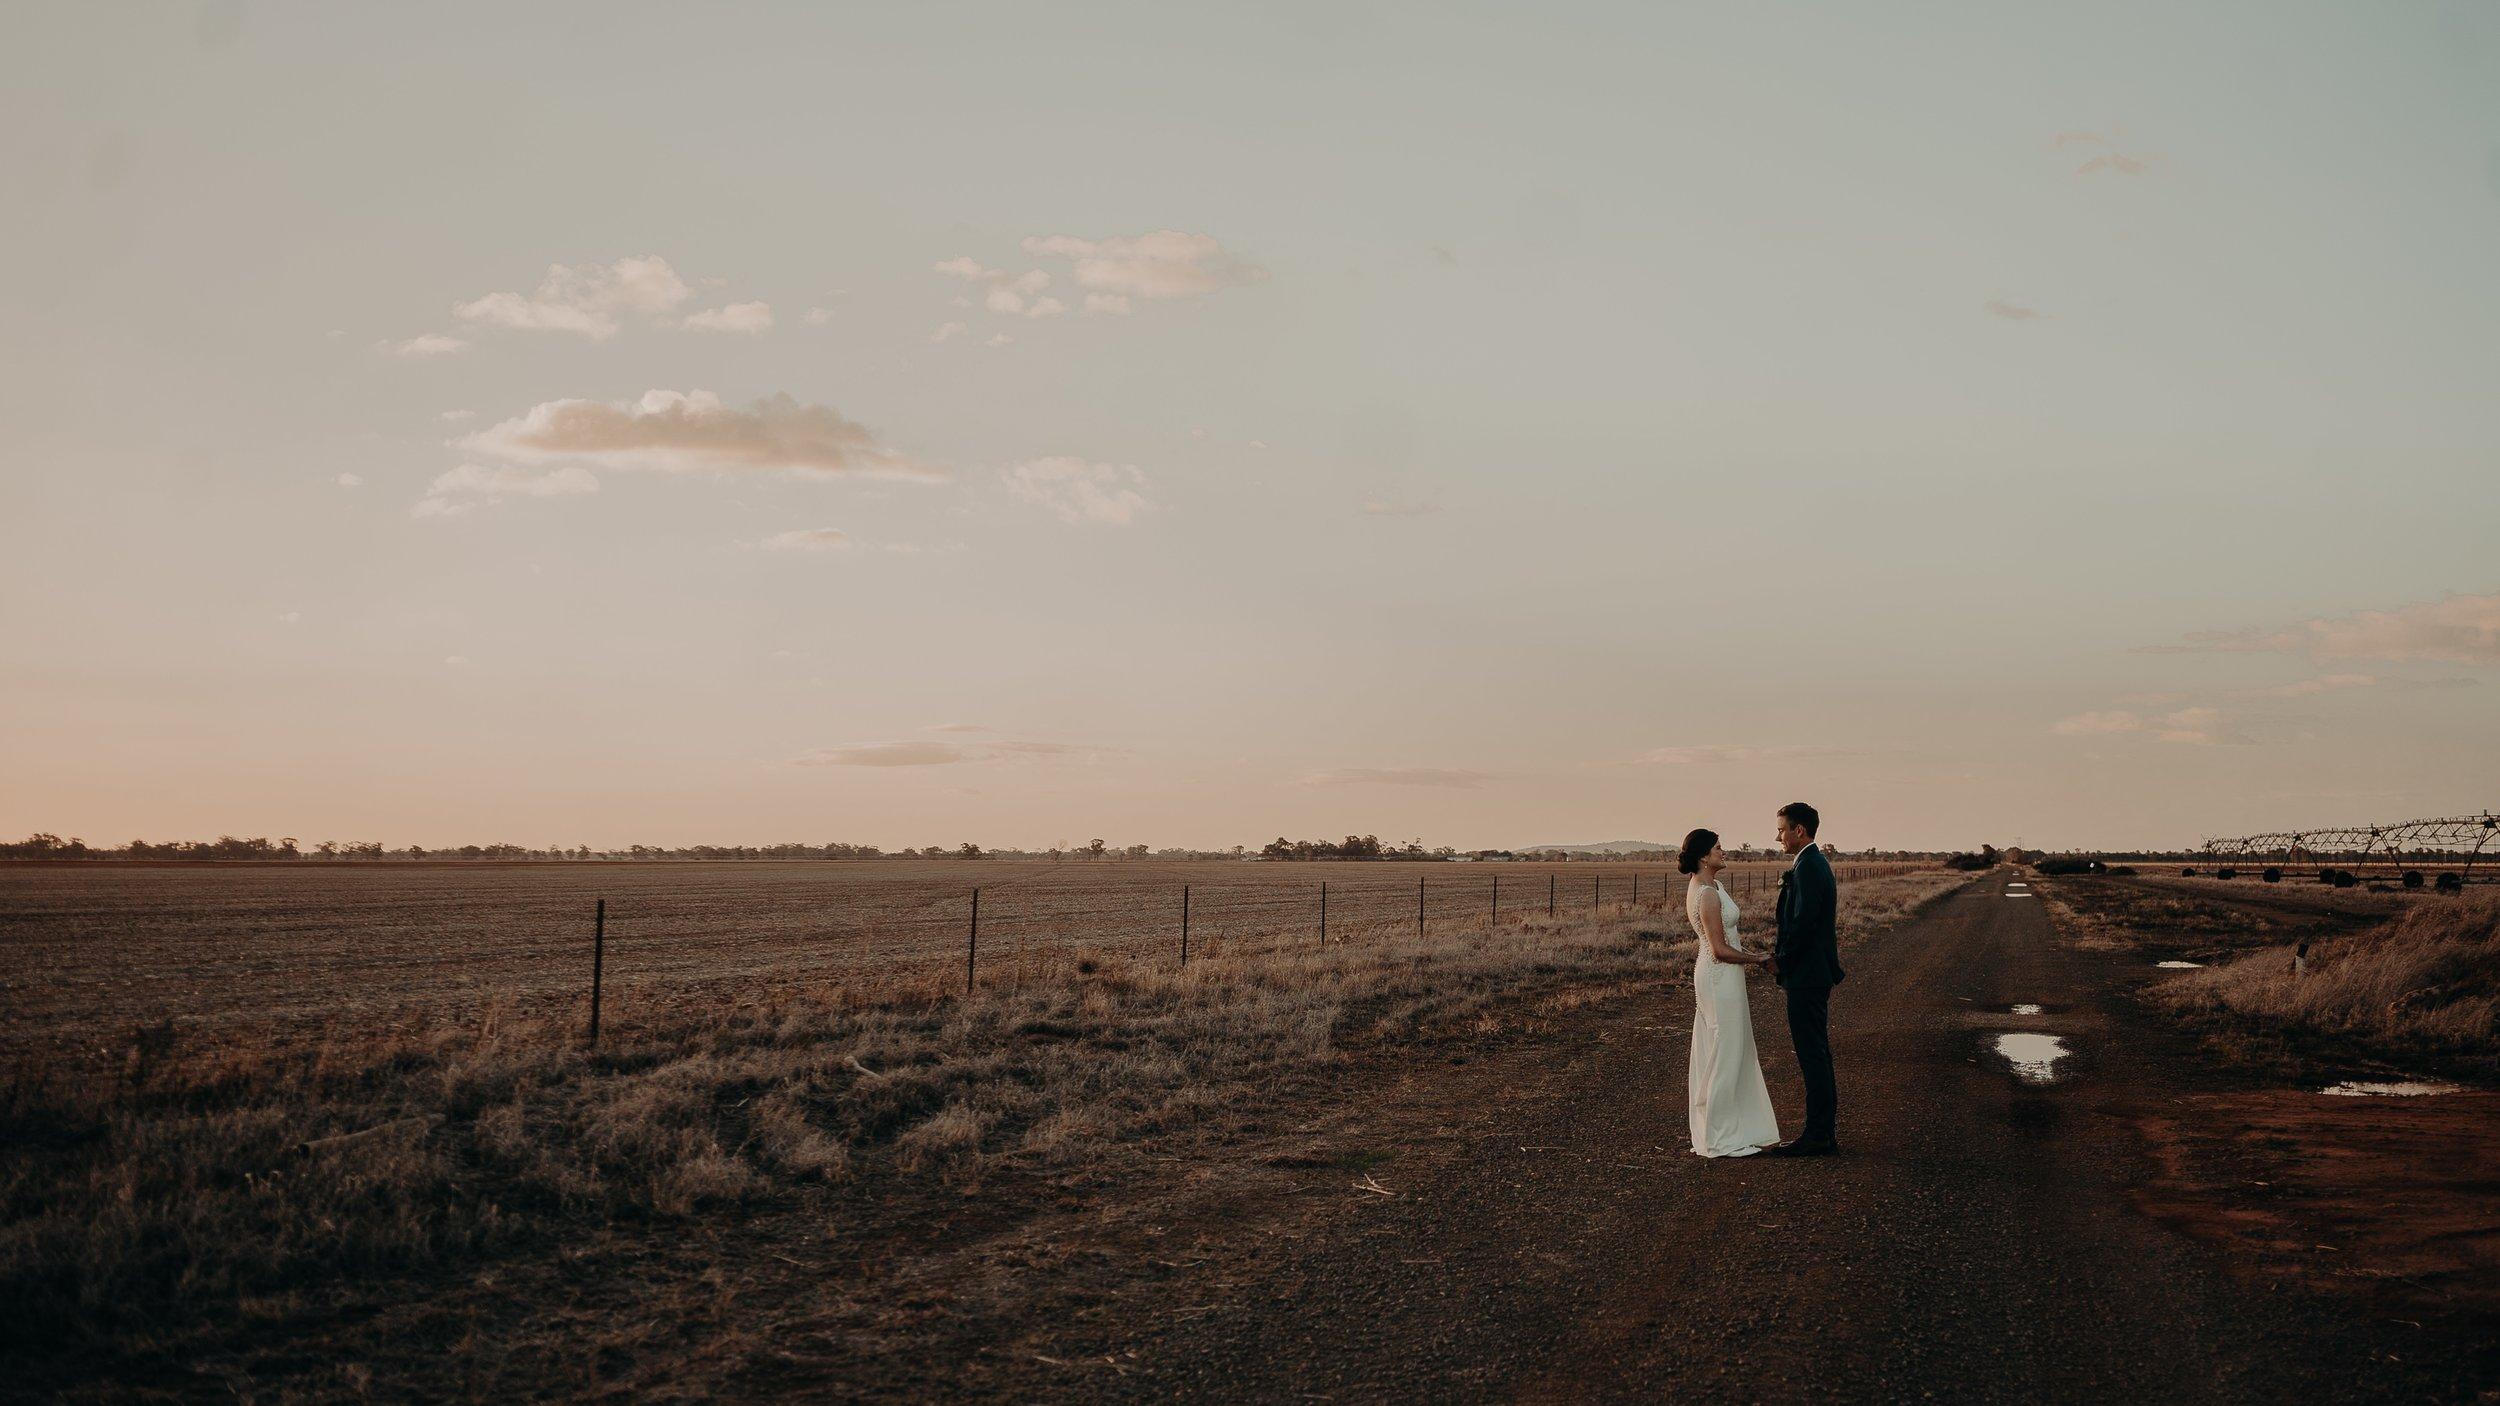 mickalathomas_puremacphotography_weddingphotographer_couplephotographer_Sheppartonphotographer_2569.jpg